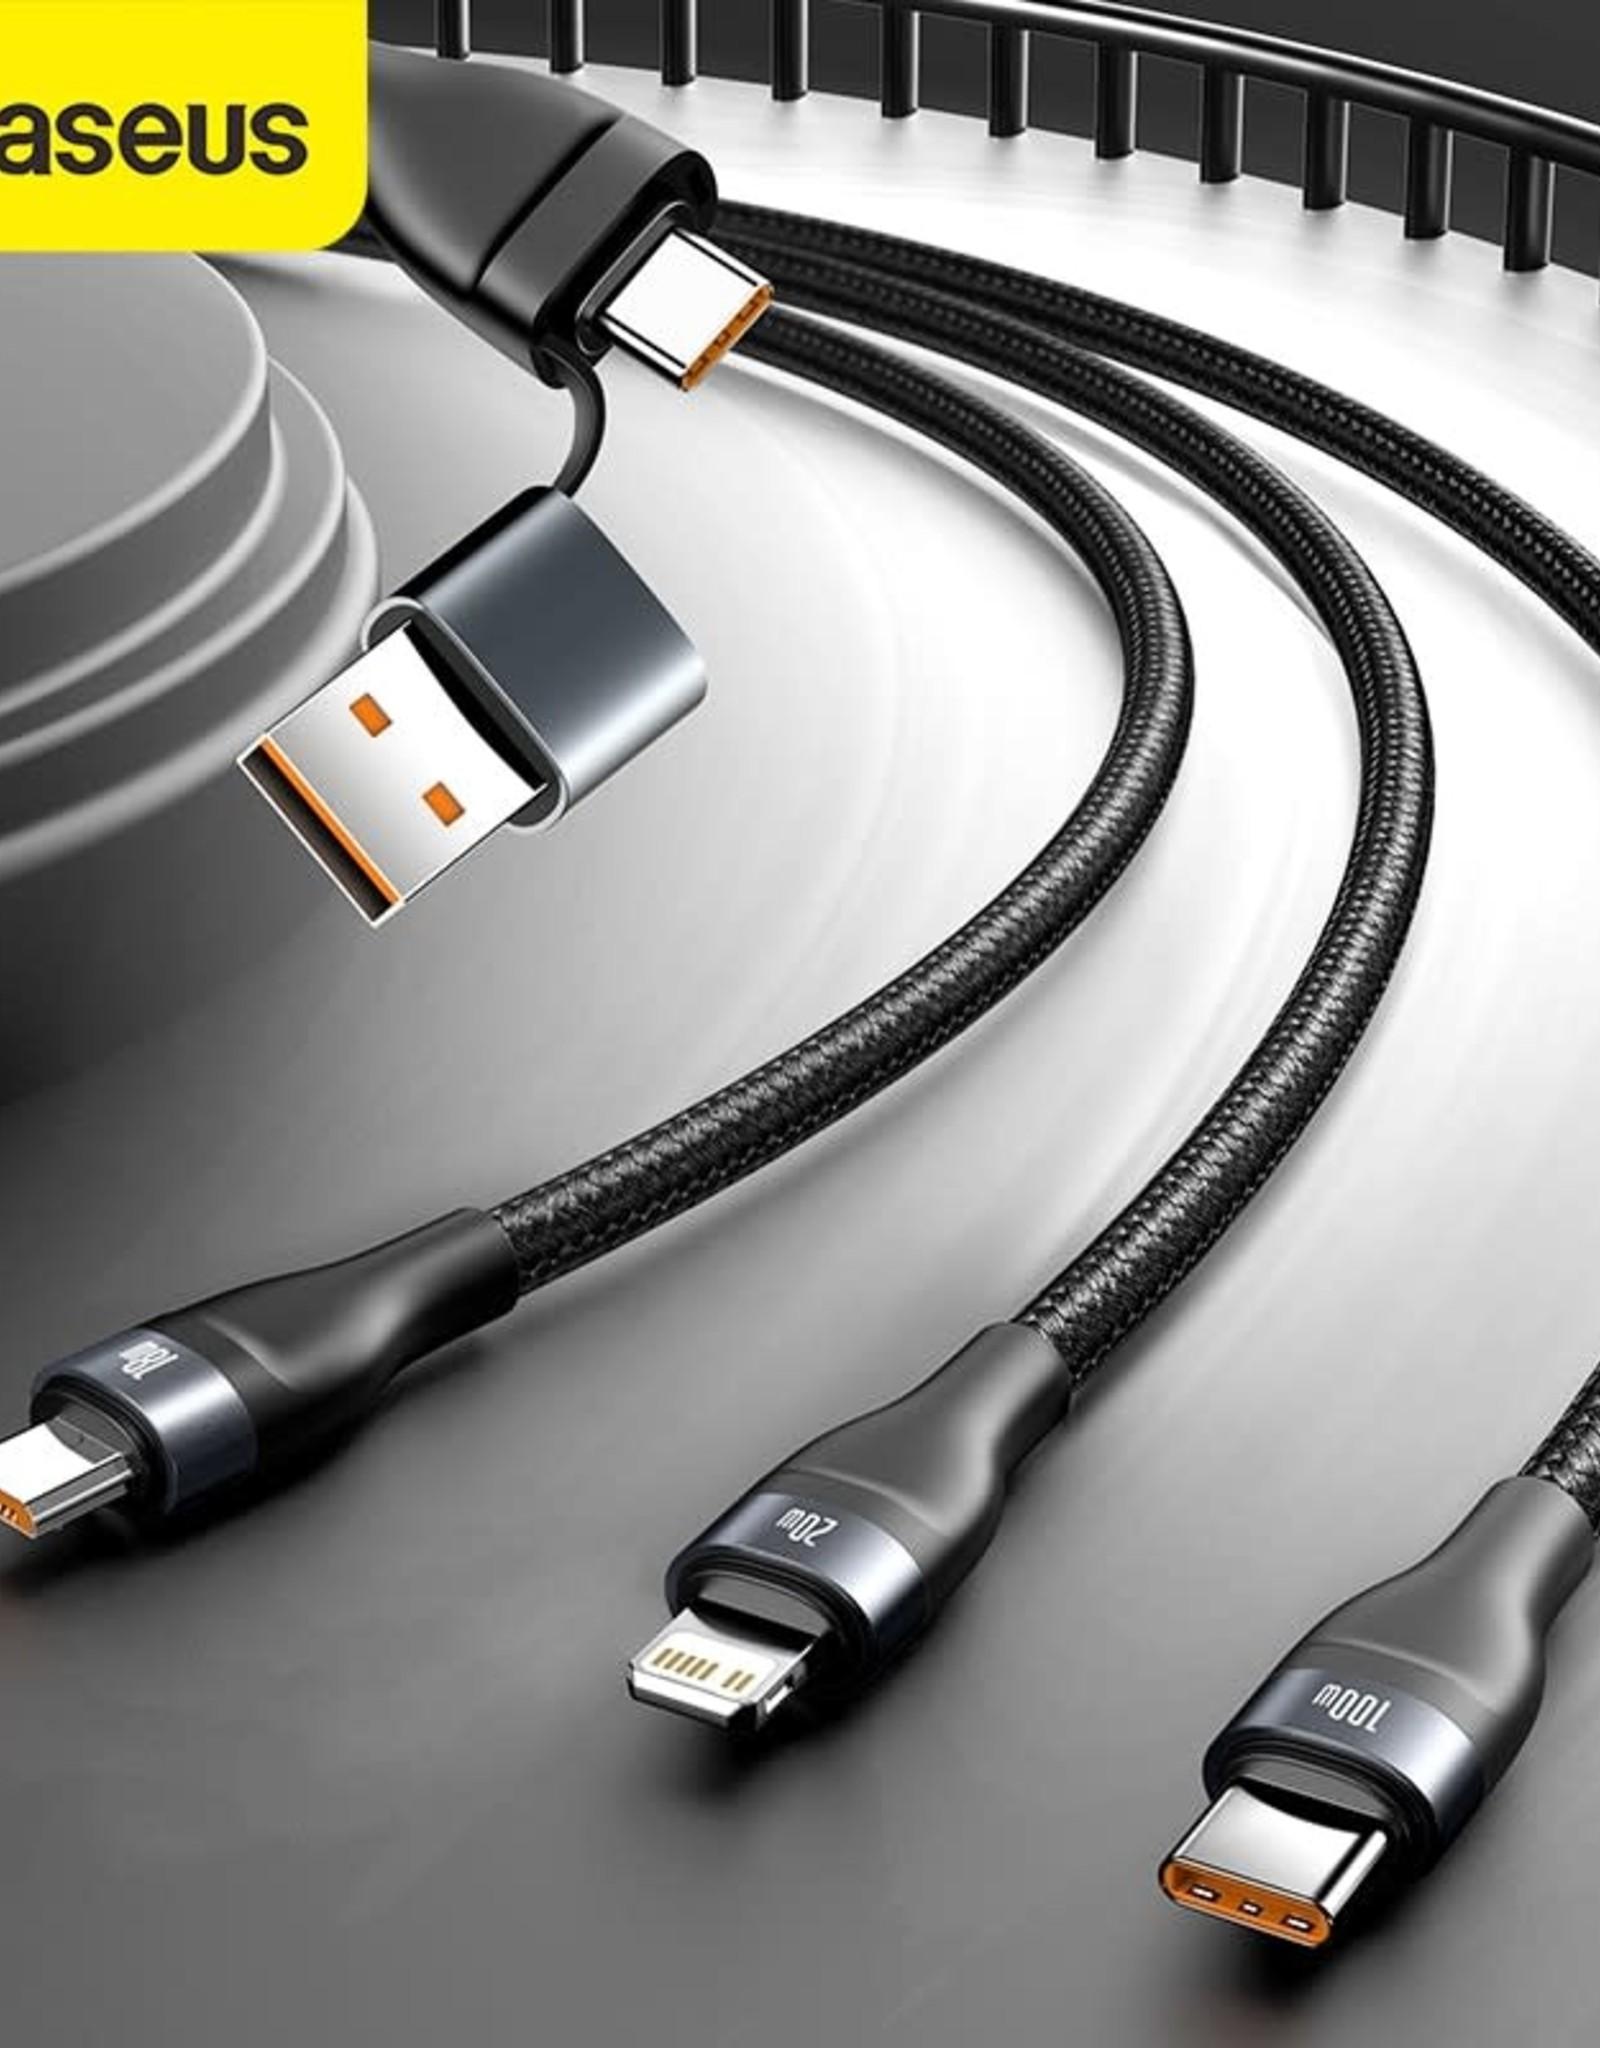 Baseus Baseus Flash Series Two-for-three Data Cable U+C to M+L+C 100W 1.2m Gray+Black